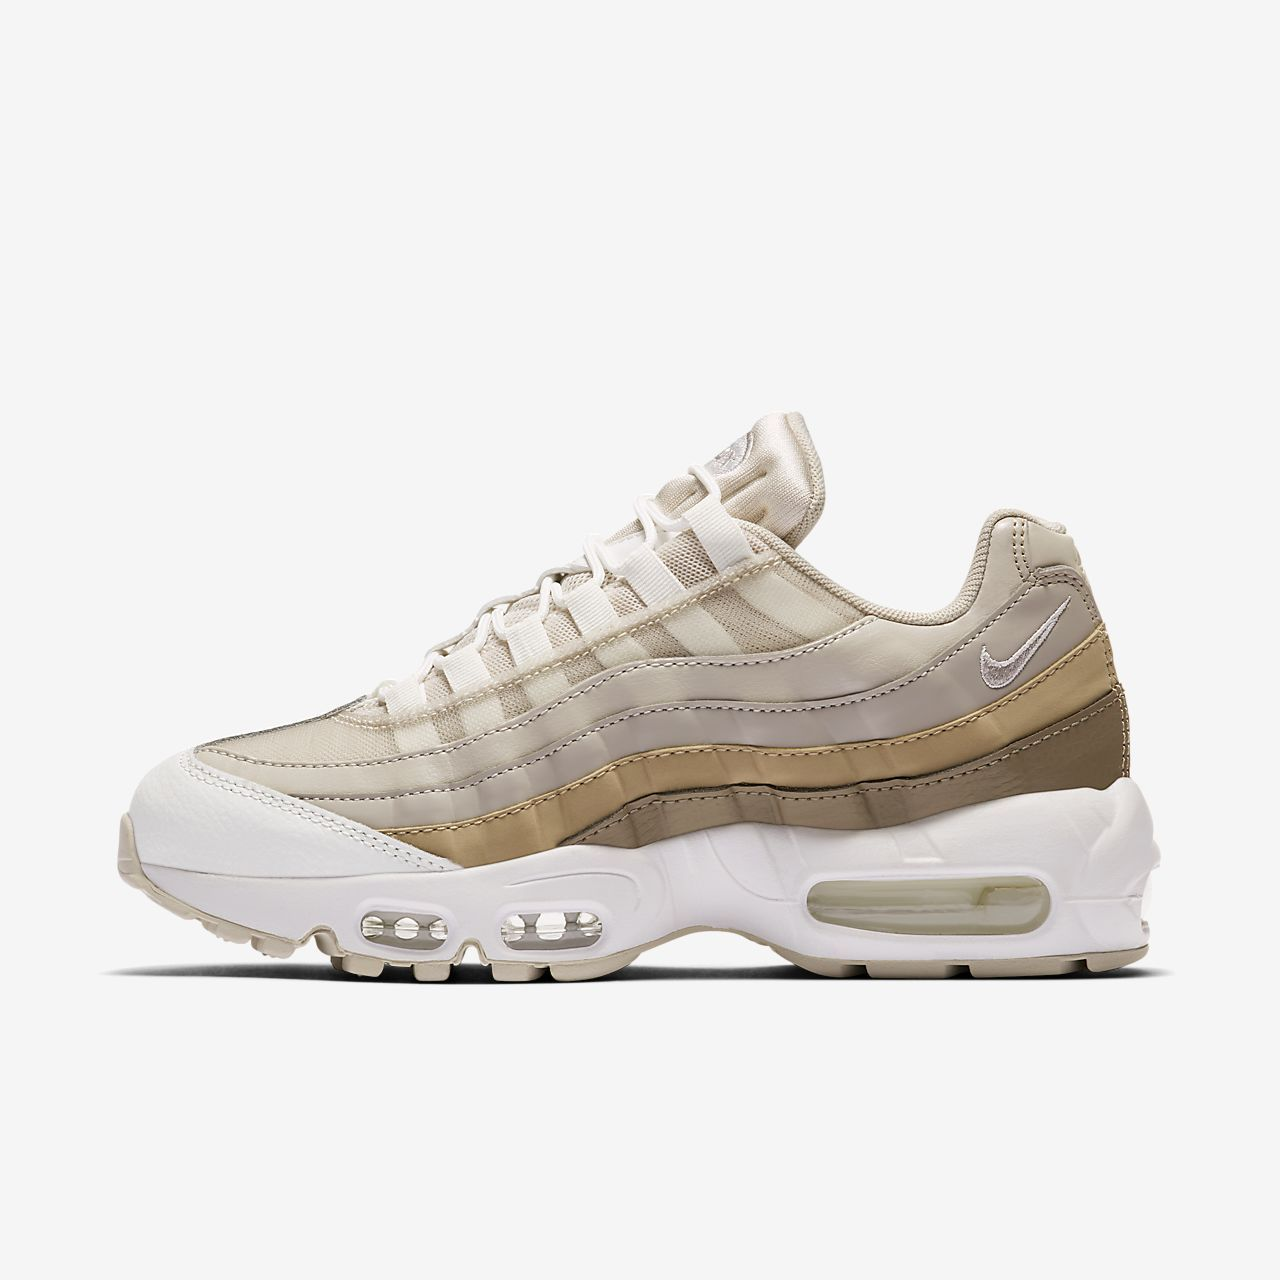 hot sale online 34fac 3ba66 Nike Air Max 95 OG Womens Shoe